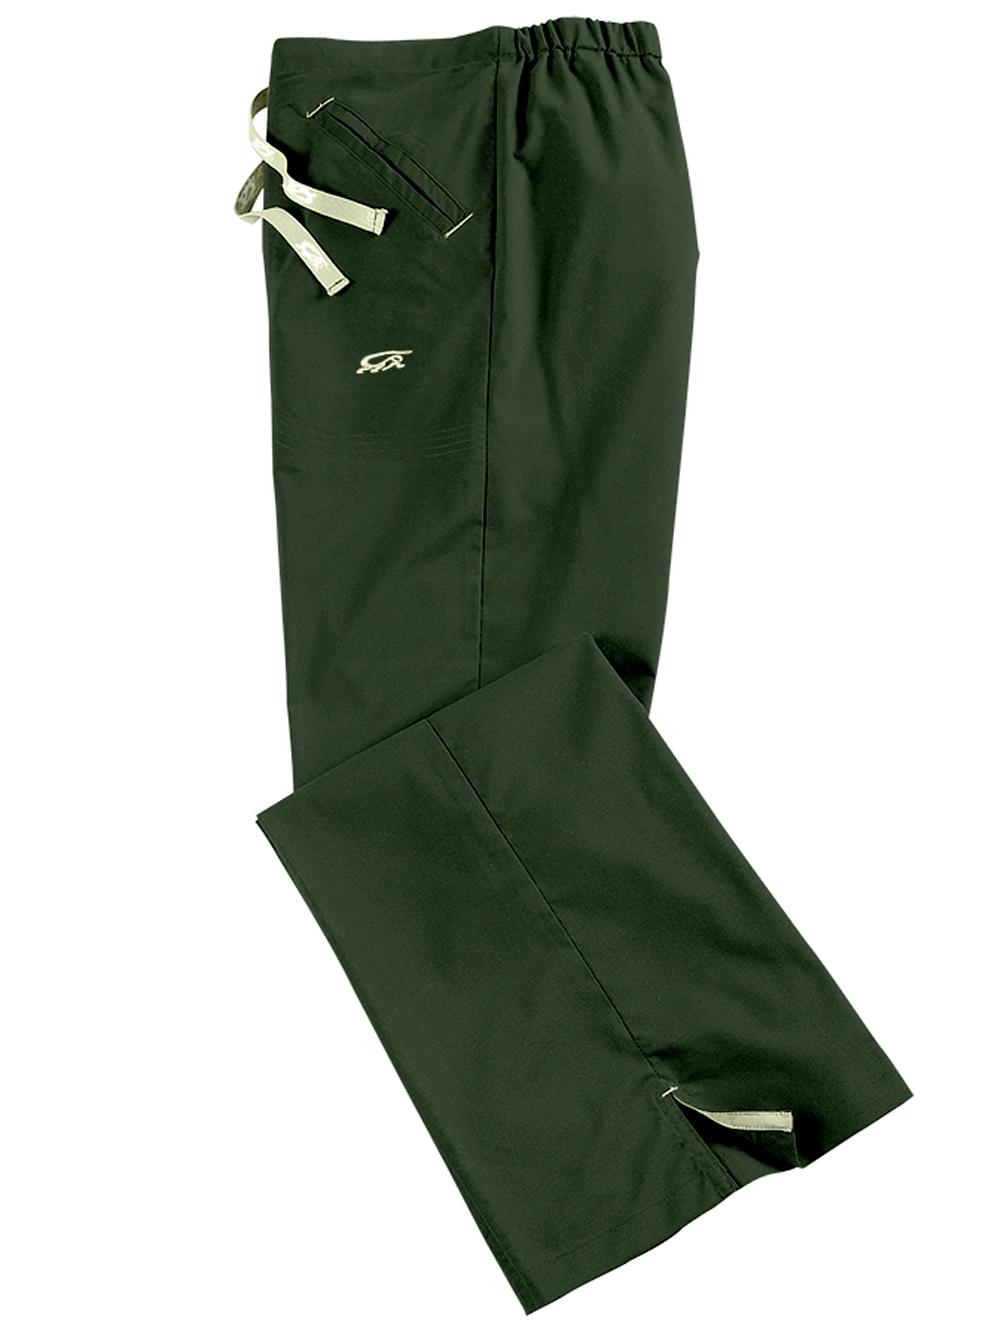 Med Flex II Flare Pant - Quattro - IguanaMed Scrubs - Brands - Metro  Uniforms - Nursing Uniforms,.